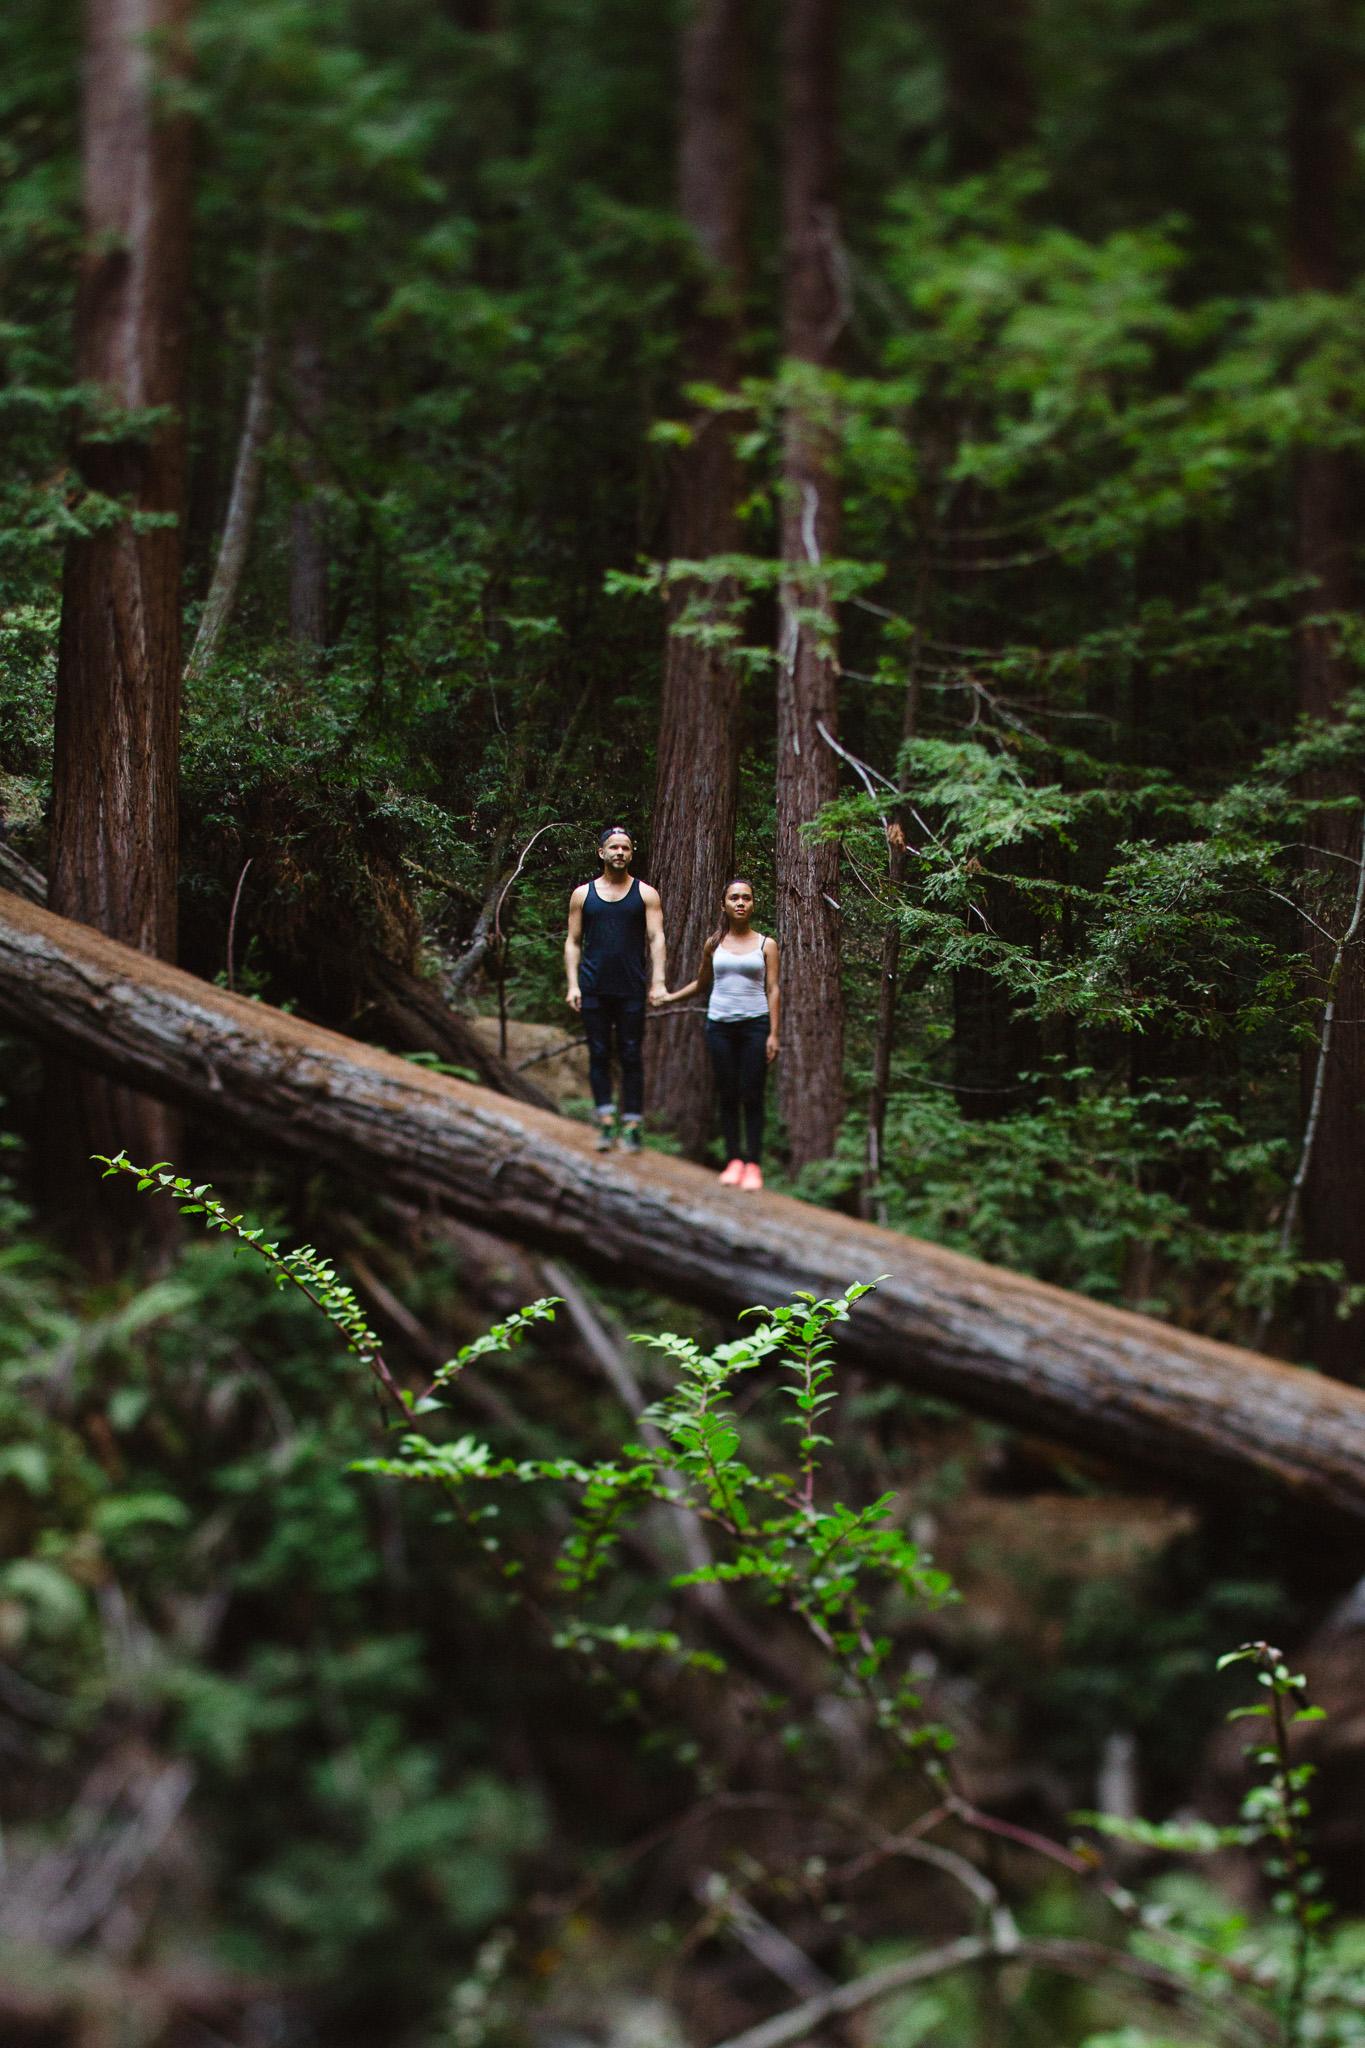 129-Jonathan-Kuhn-Photography-West-Coast-Trip-Prelim-WEB-2683.jpg